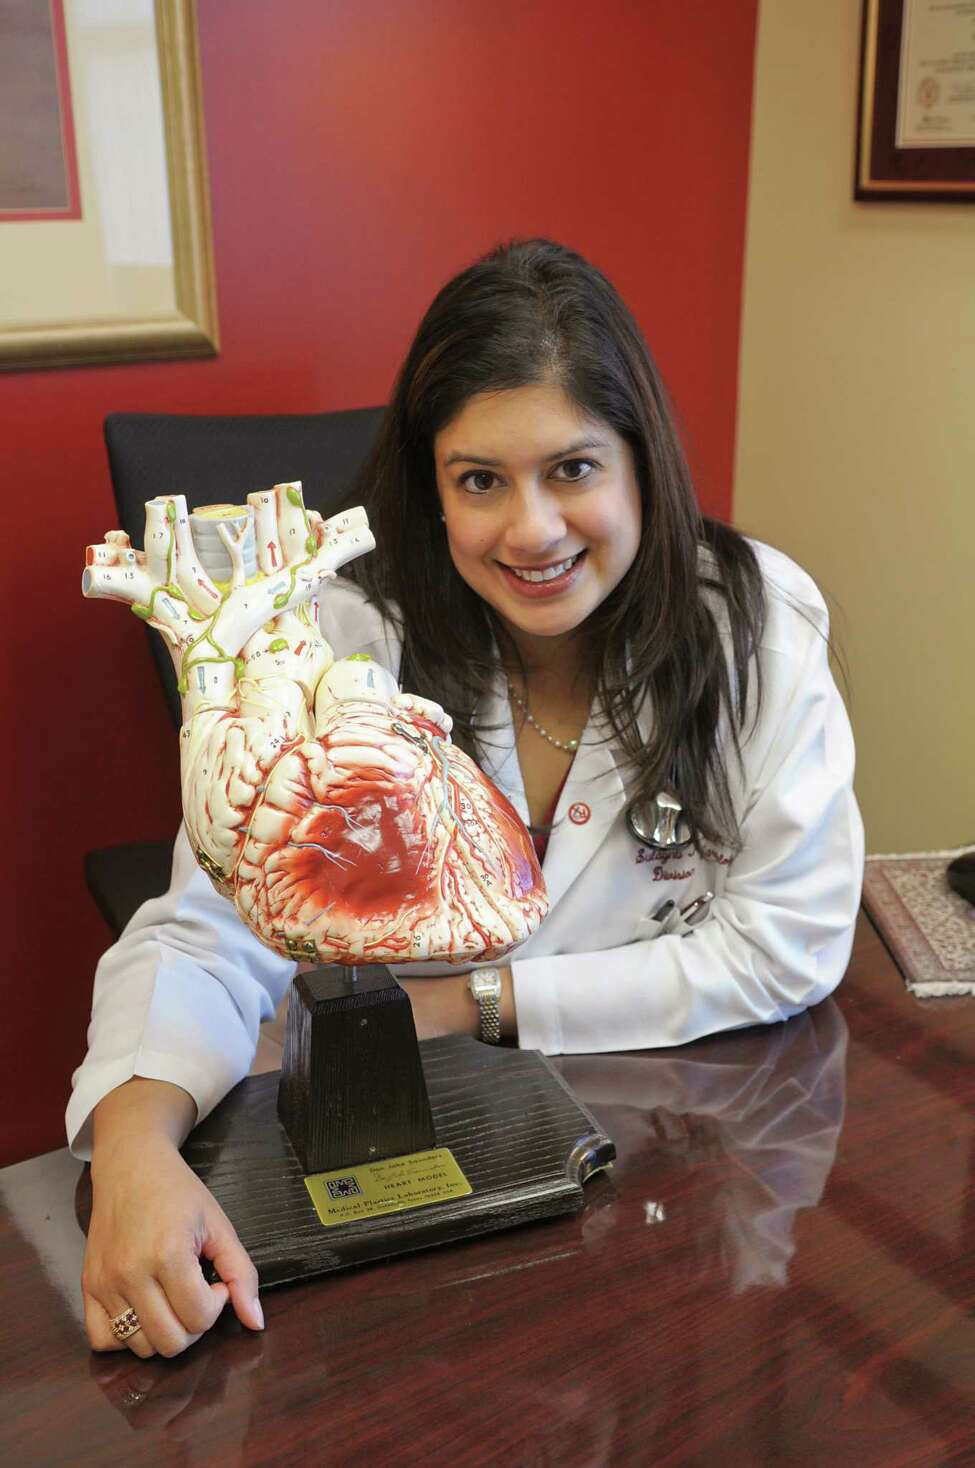 Dr. Sulagna Mookherjee, cardiologist at Albany Medical Center